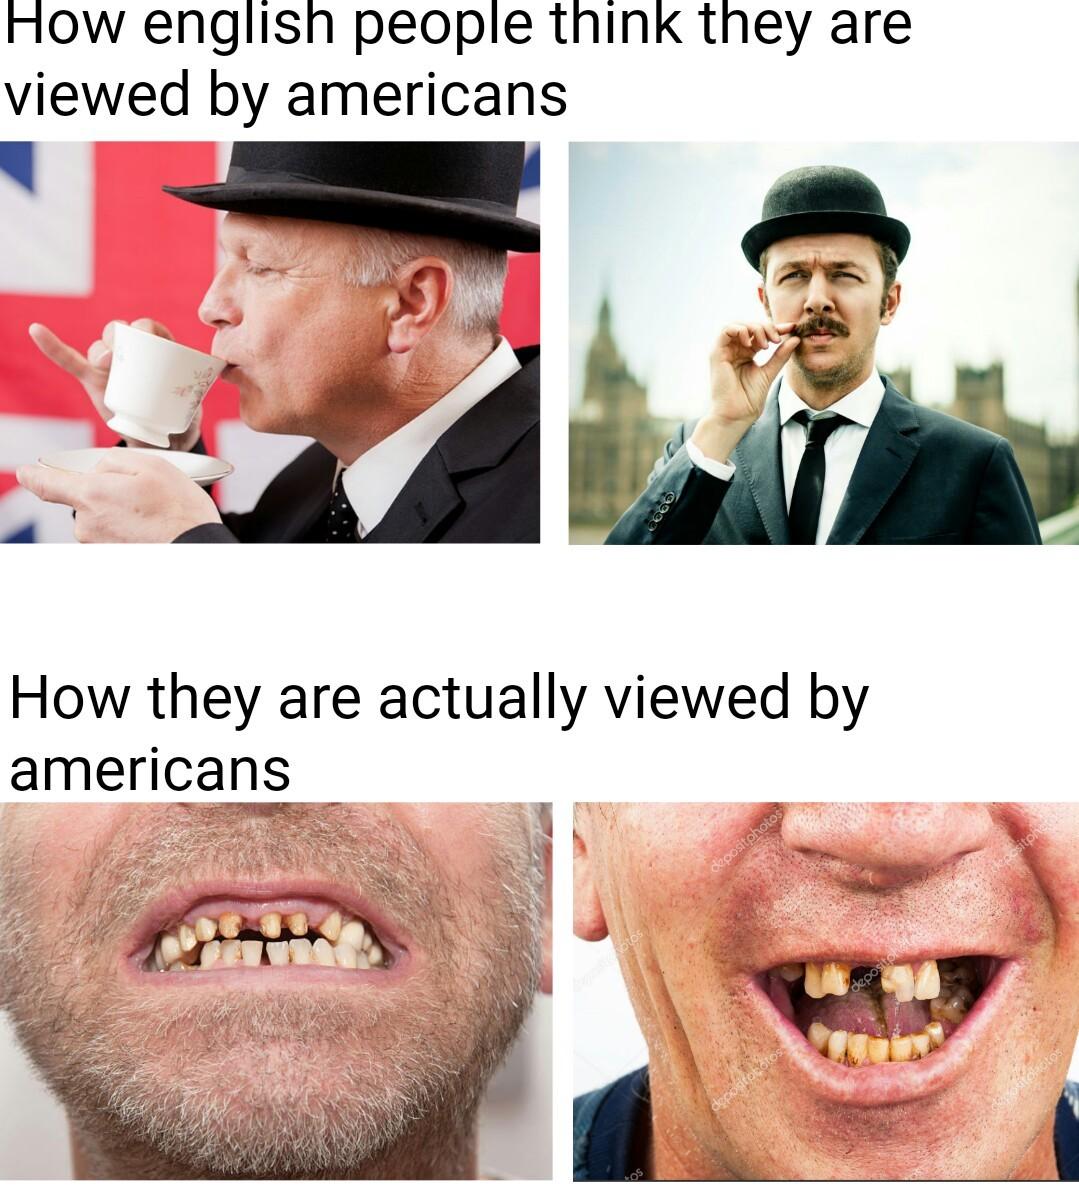 I'm not american so don't hate - meme